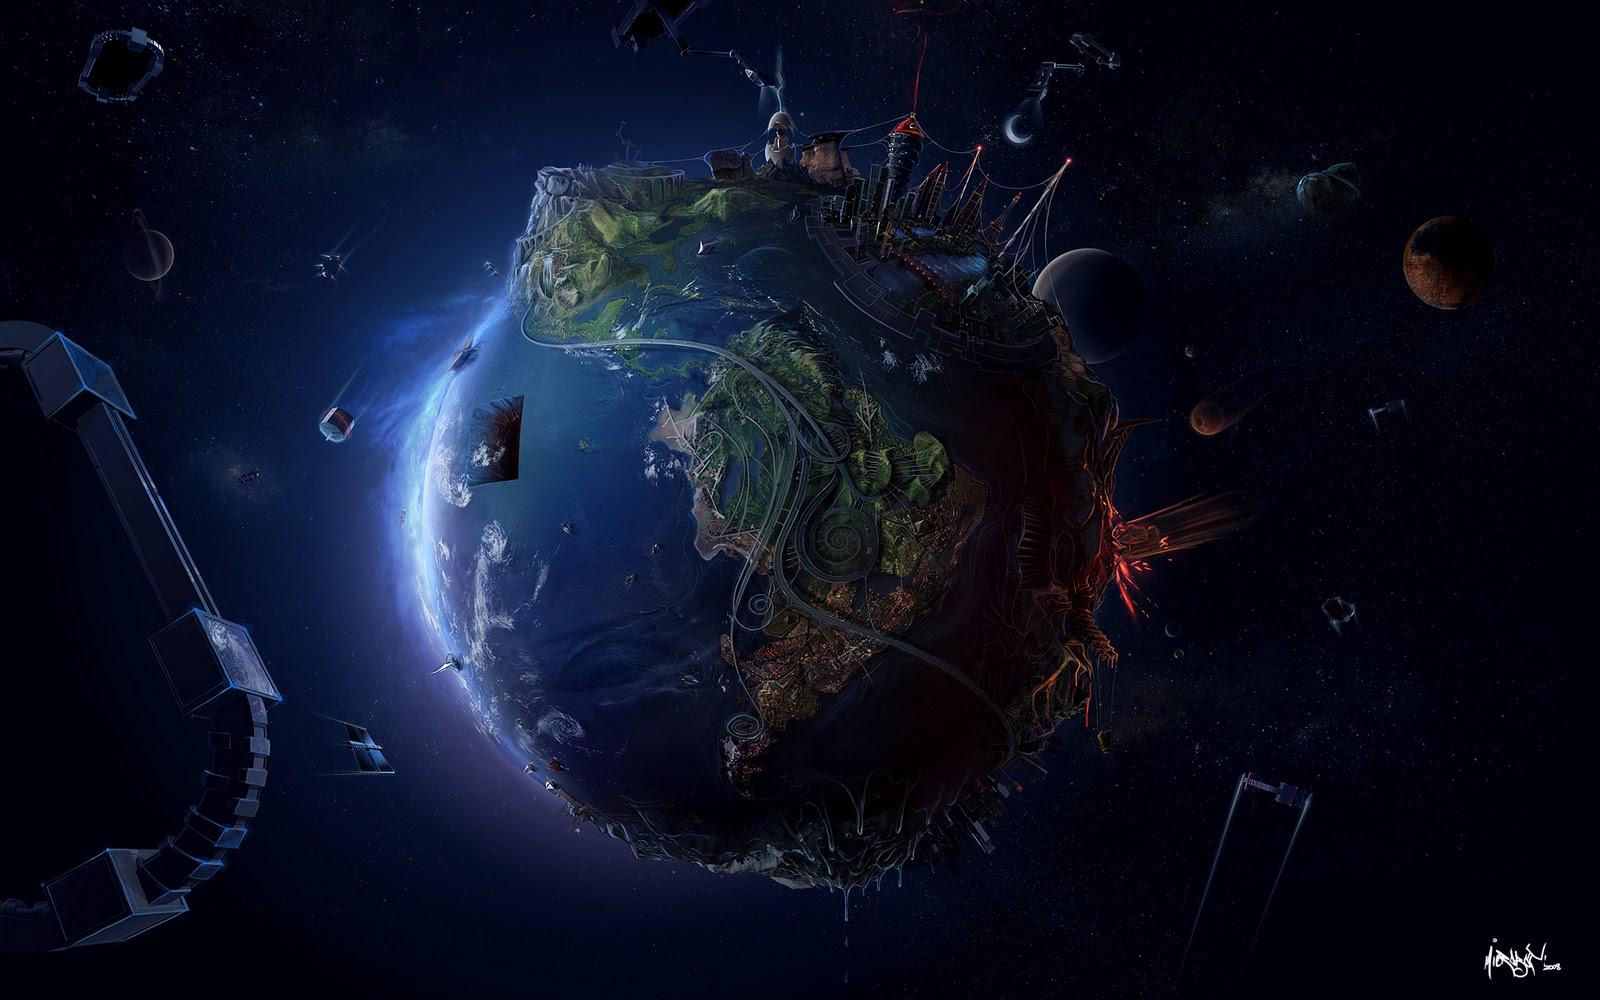 Vibrant planetary background